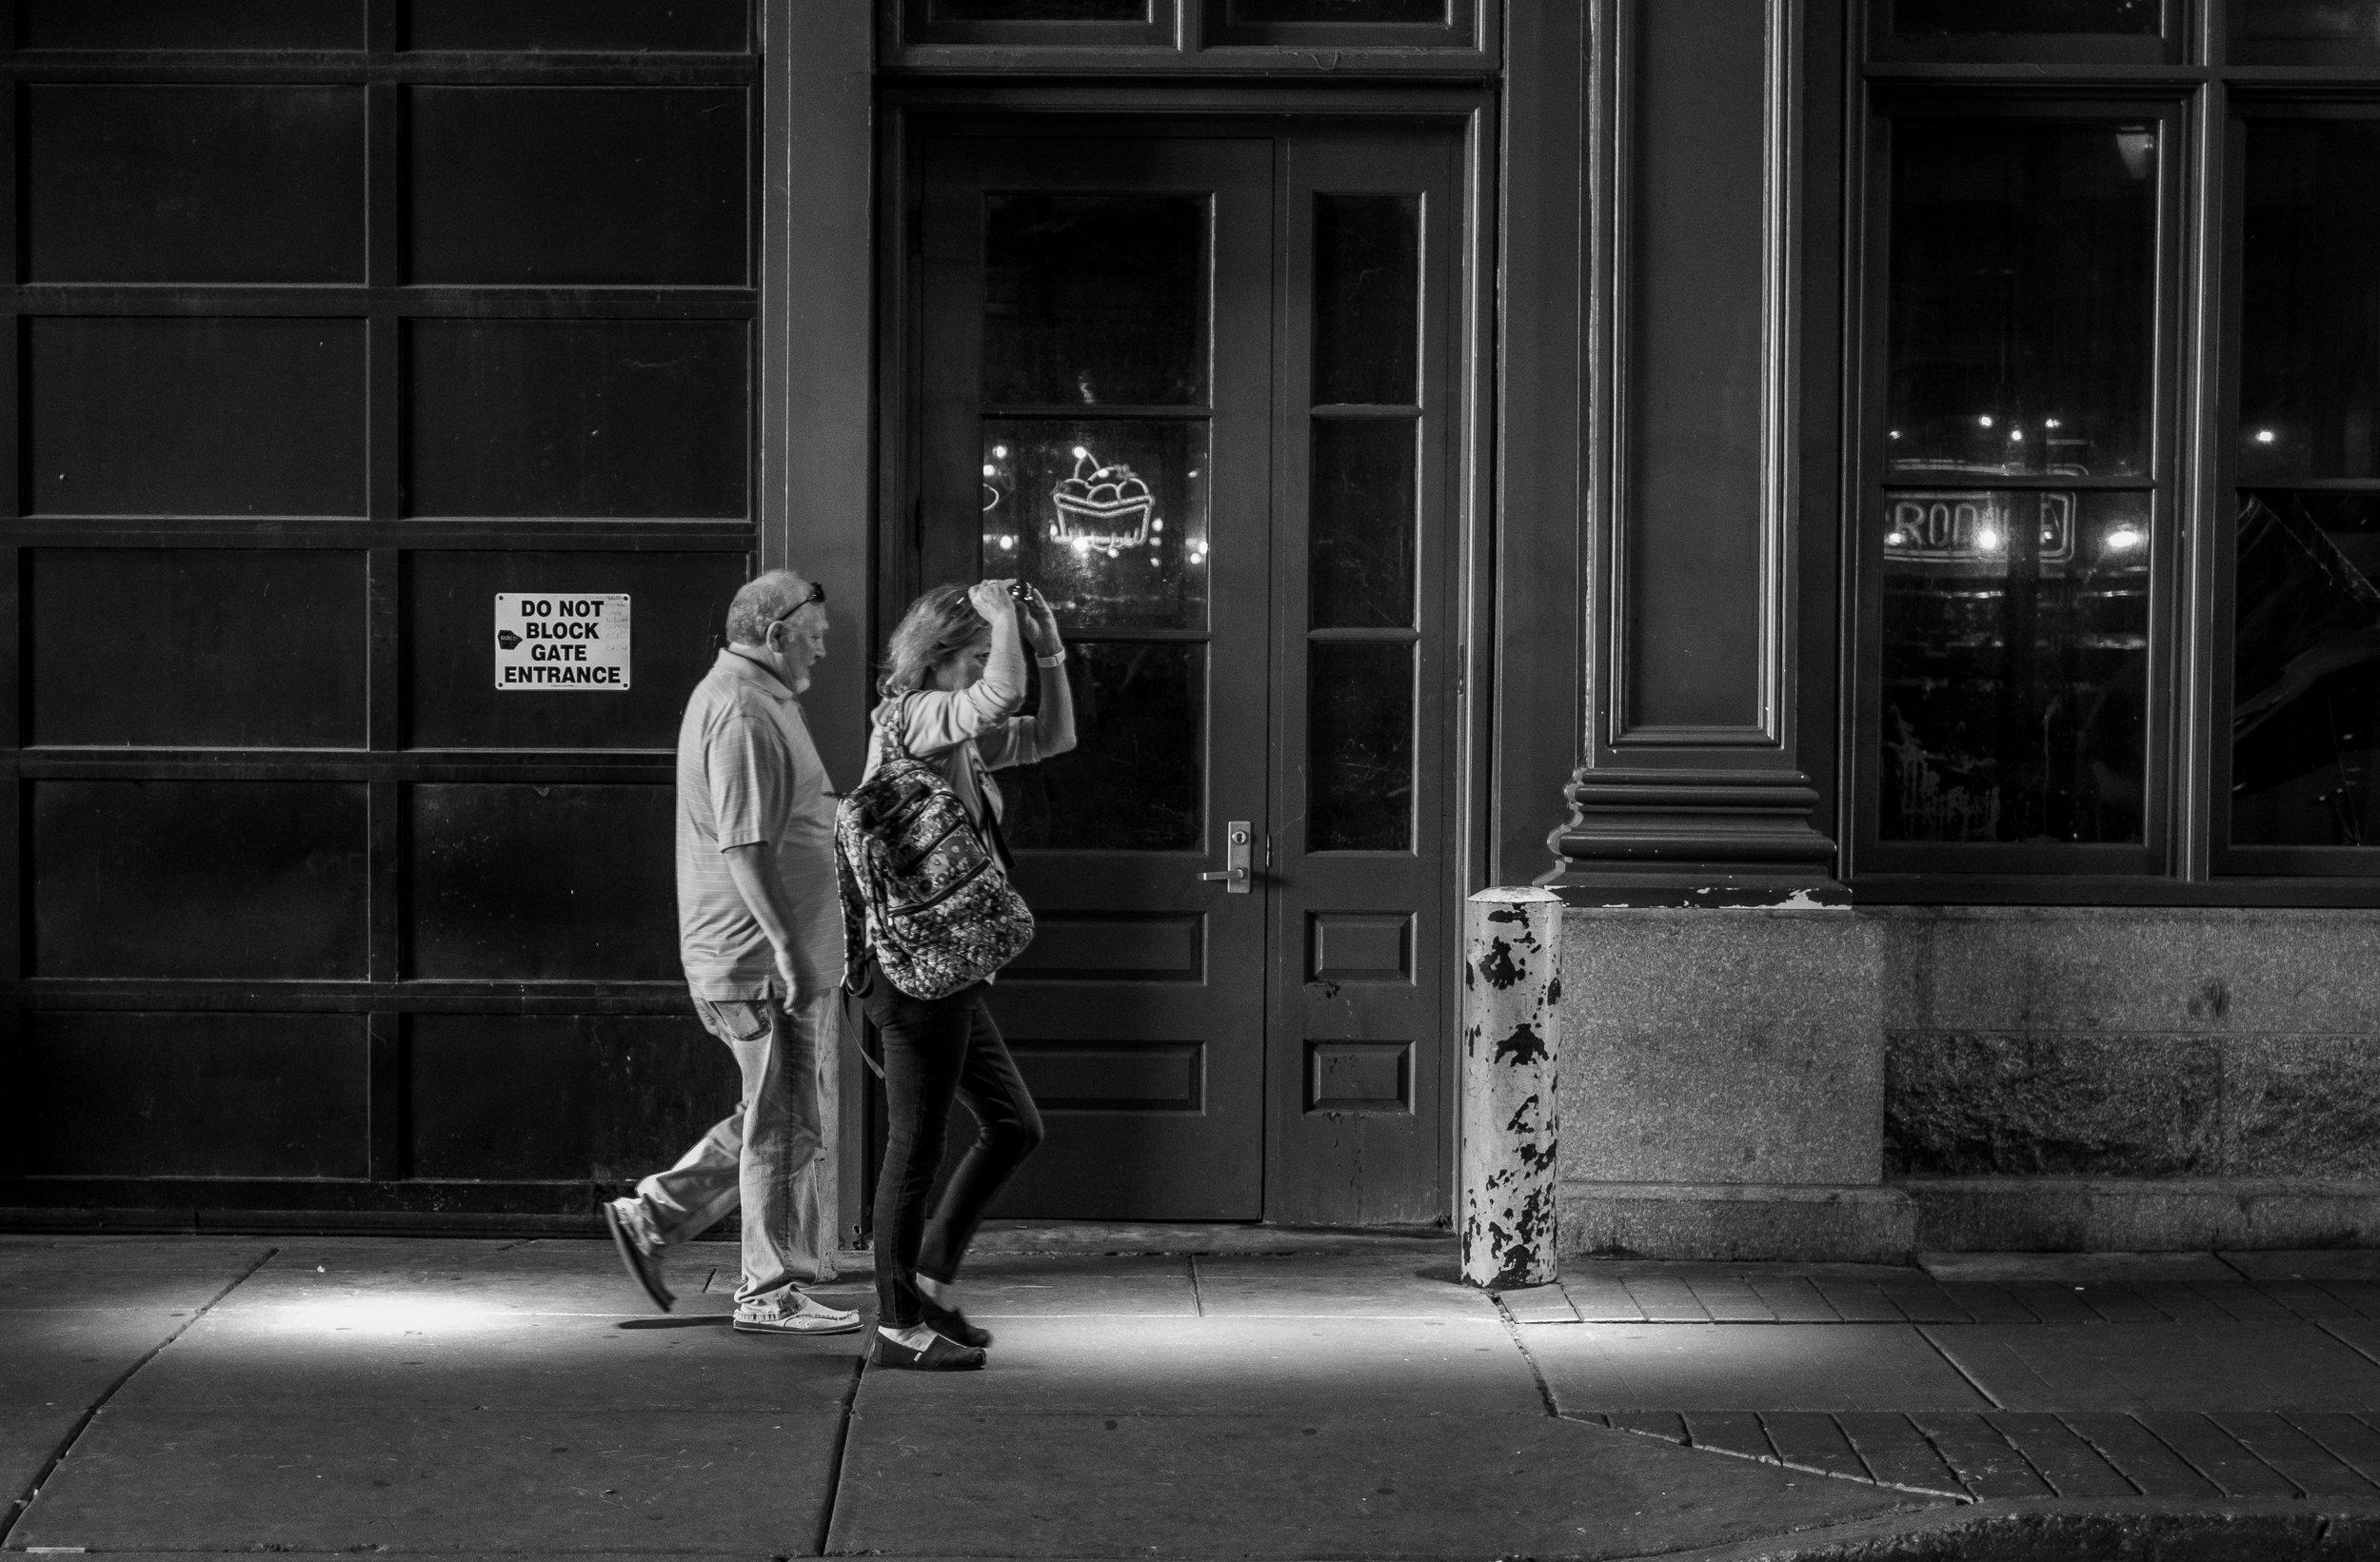 Walk into the Light ©2019 S. Karp